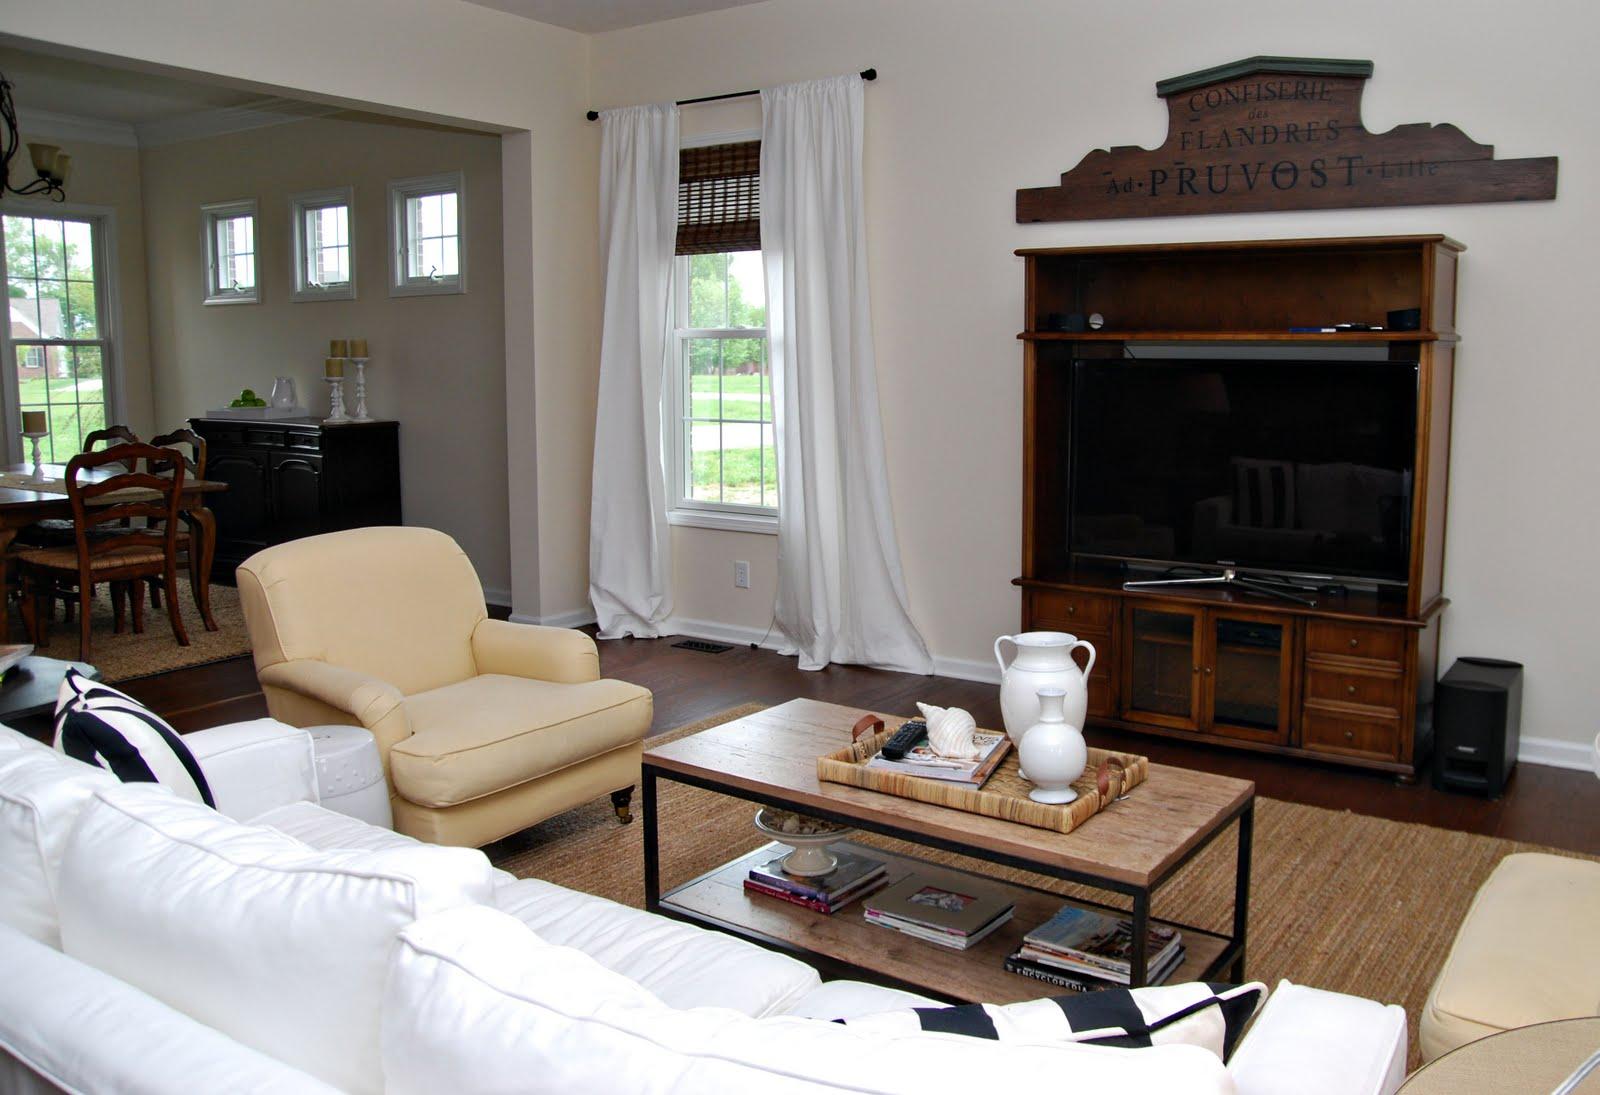 http://3.bp.blogspot.com/_ixdeZNERIQE/S_2lcGxjv2I/AAAAAAAAAiM/3DRFbclAS7s/s1600/family+room.jpg